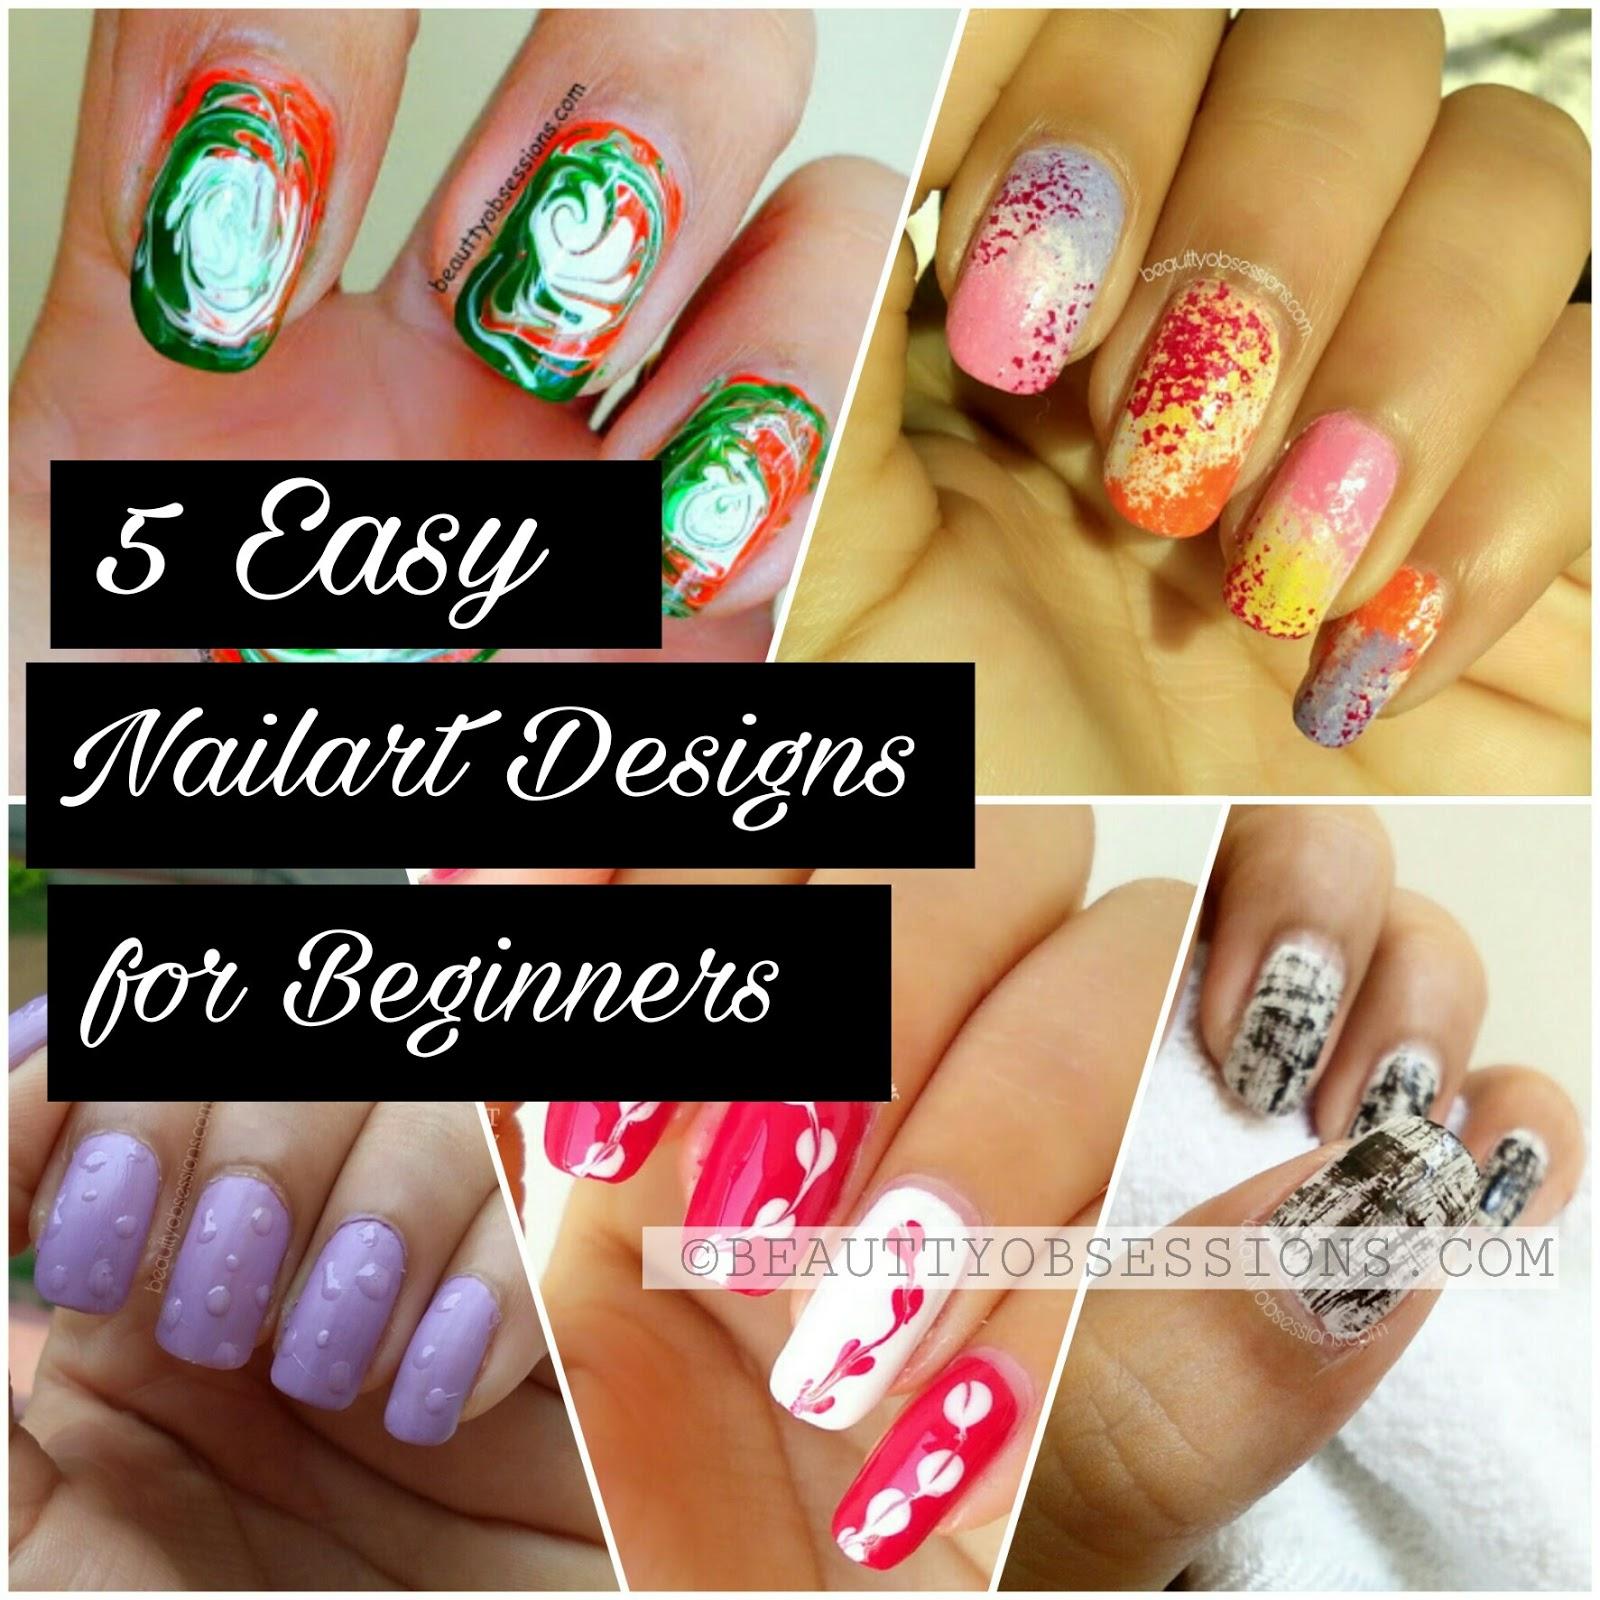 5 easiest nailart designs for beginners